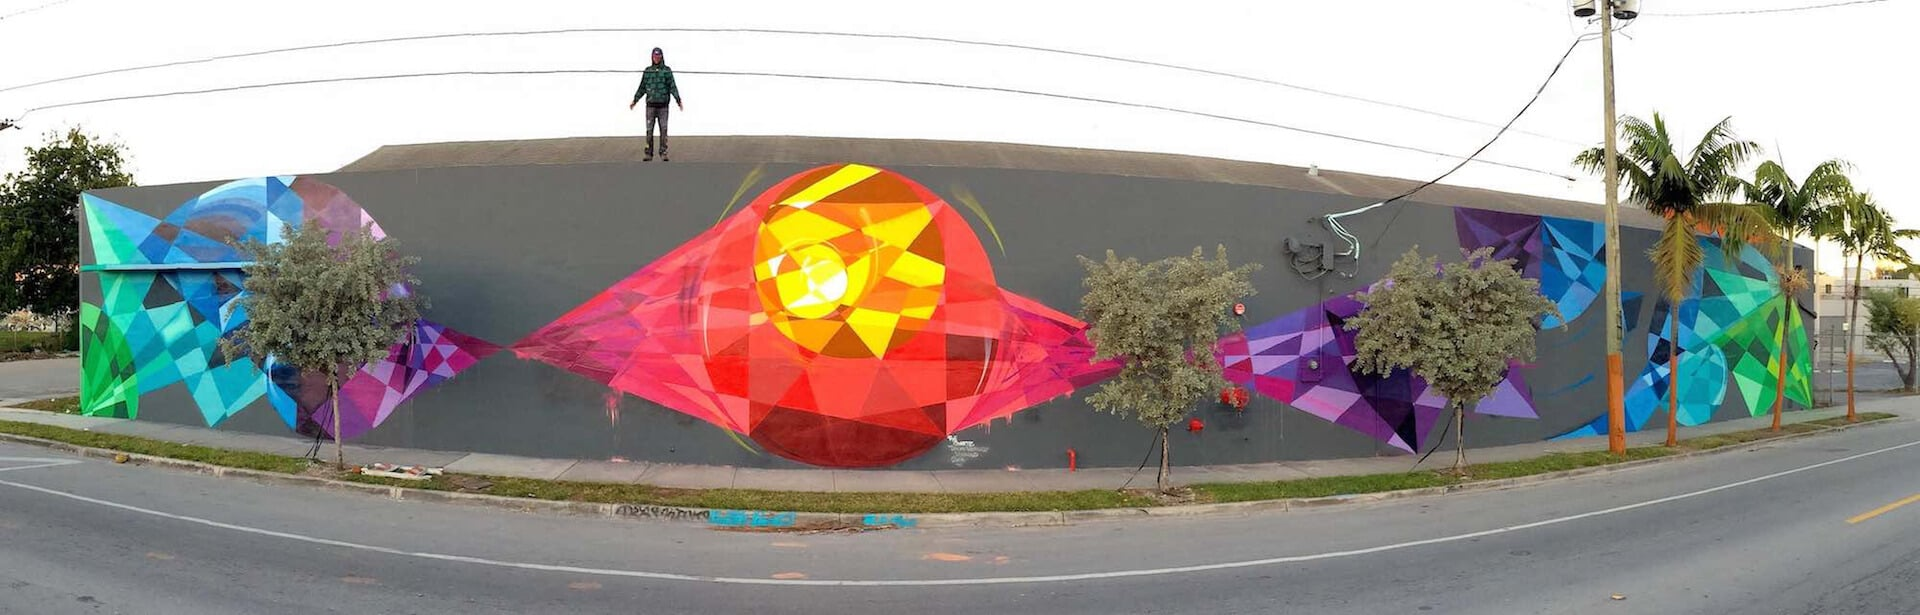 Urban Contemporary Mural 2 for Art Basel | Wynwood USA, 2014